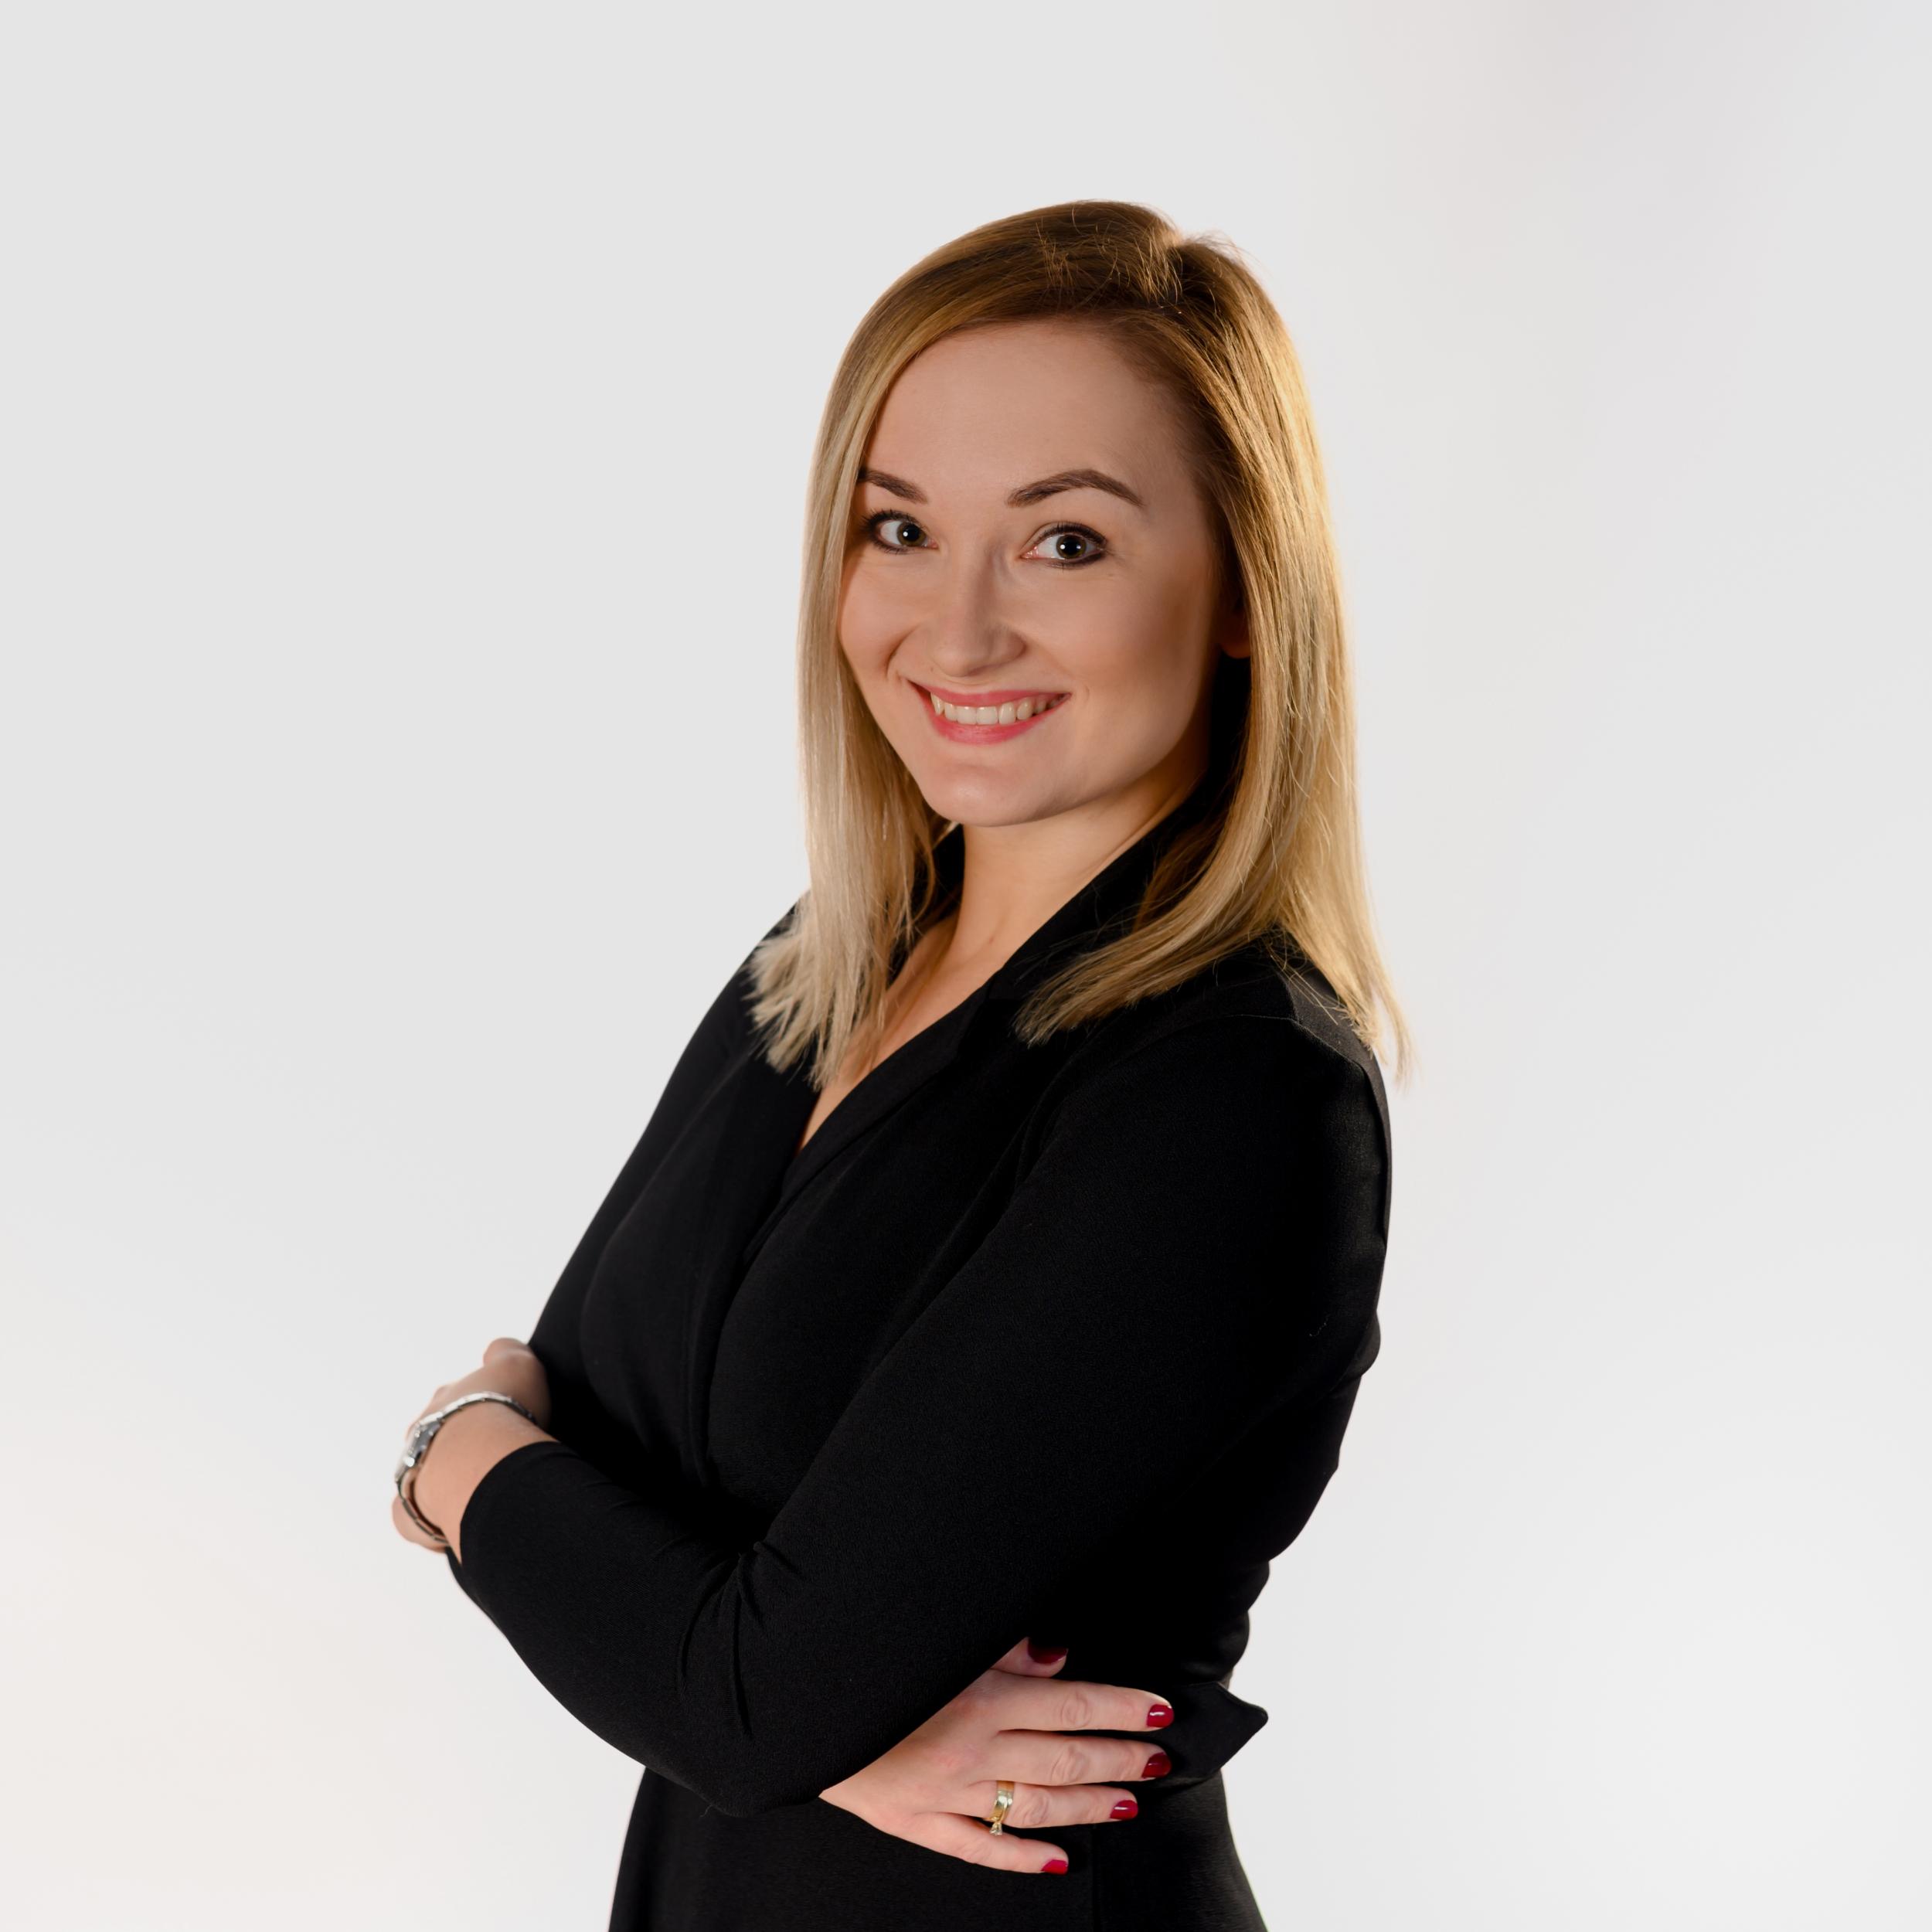 Monika Roszkowska